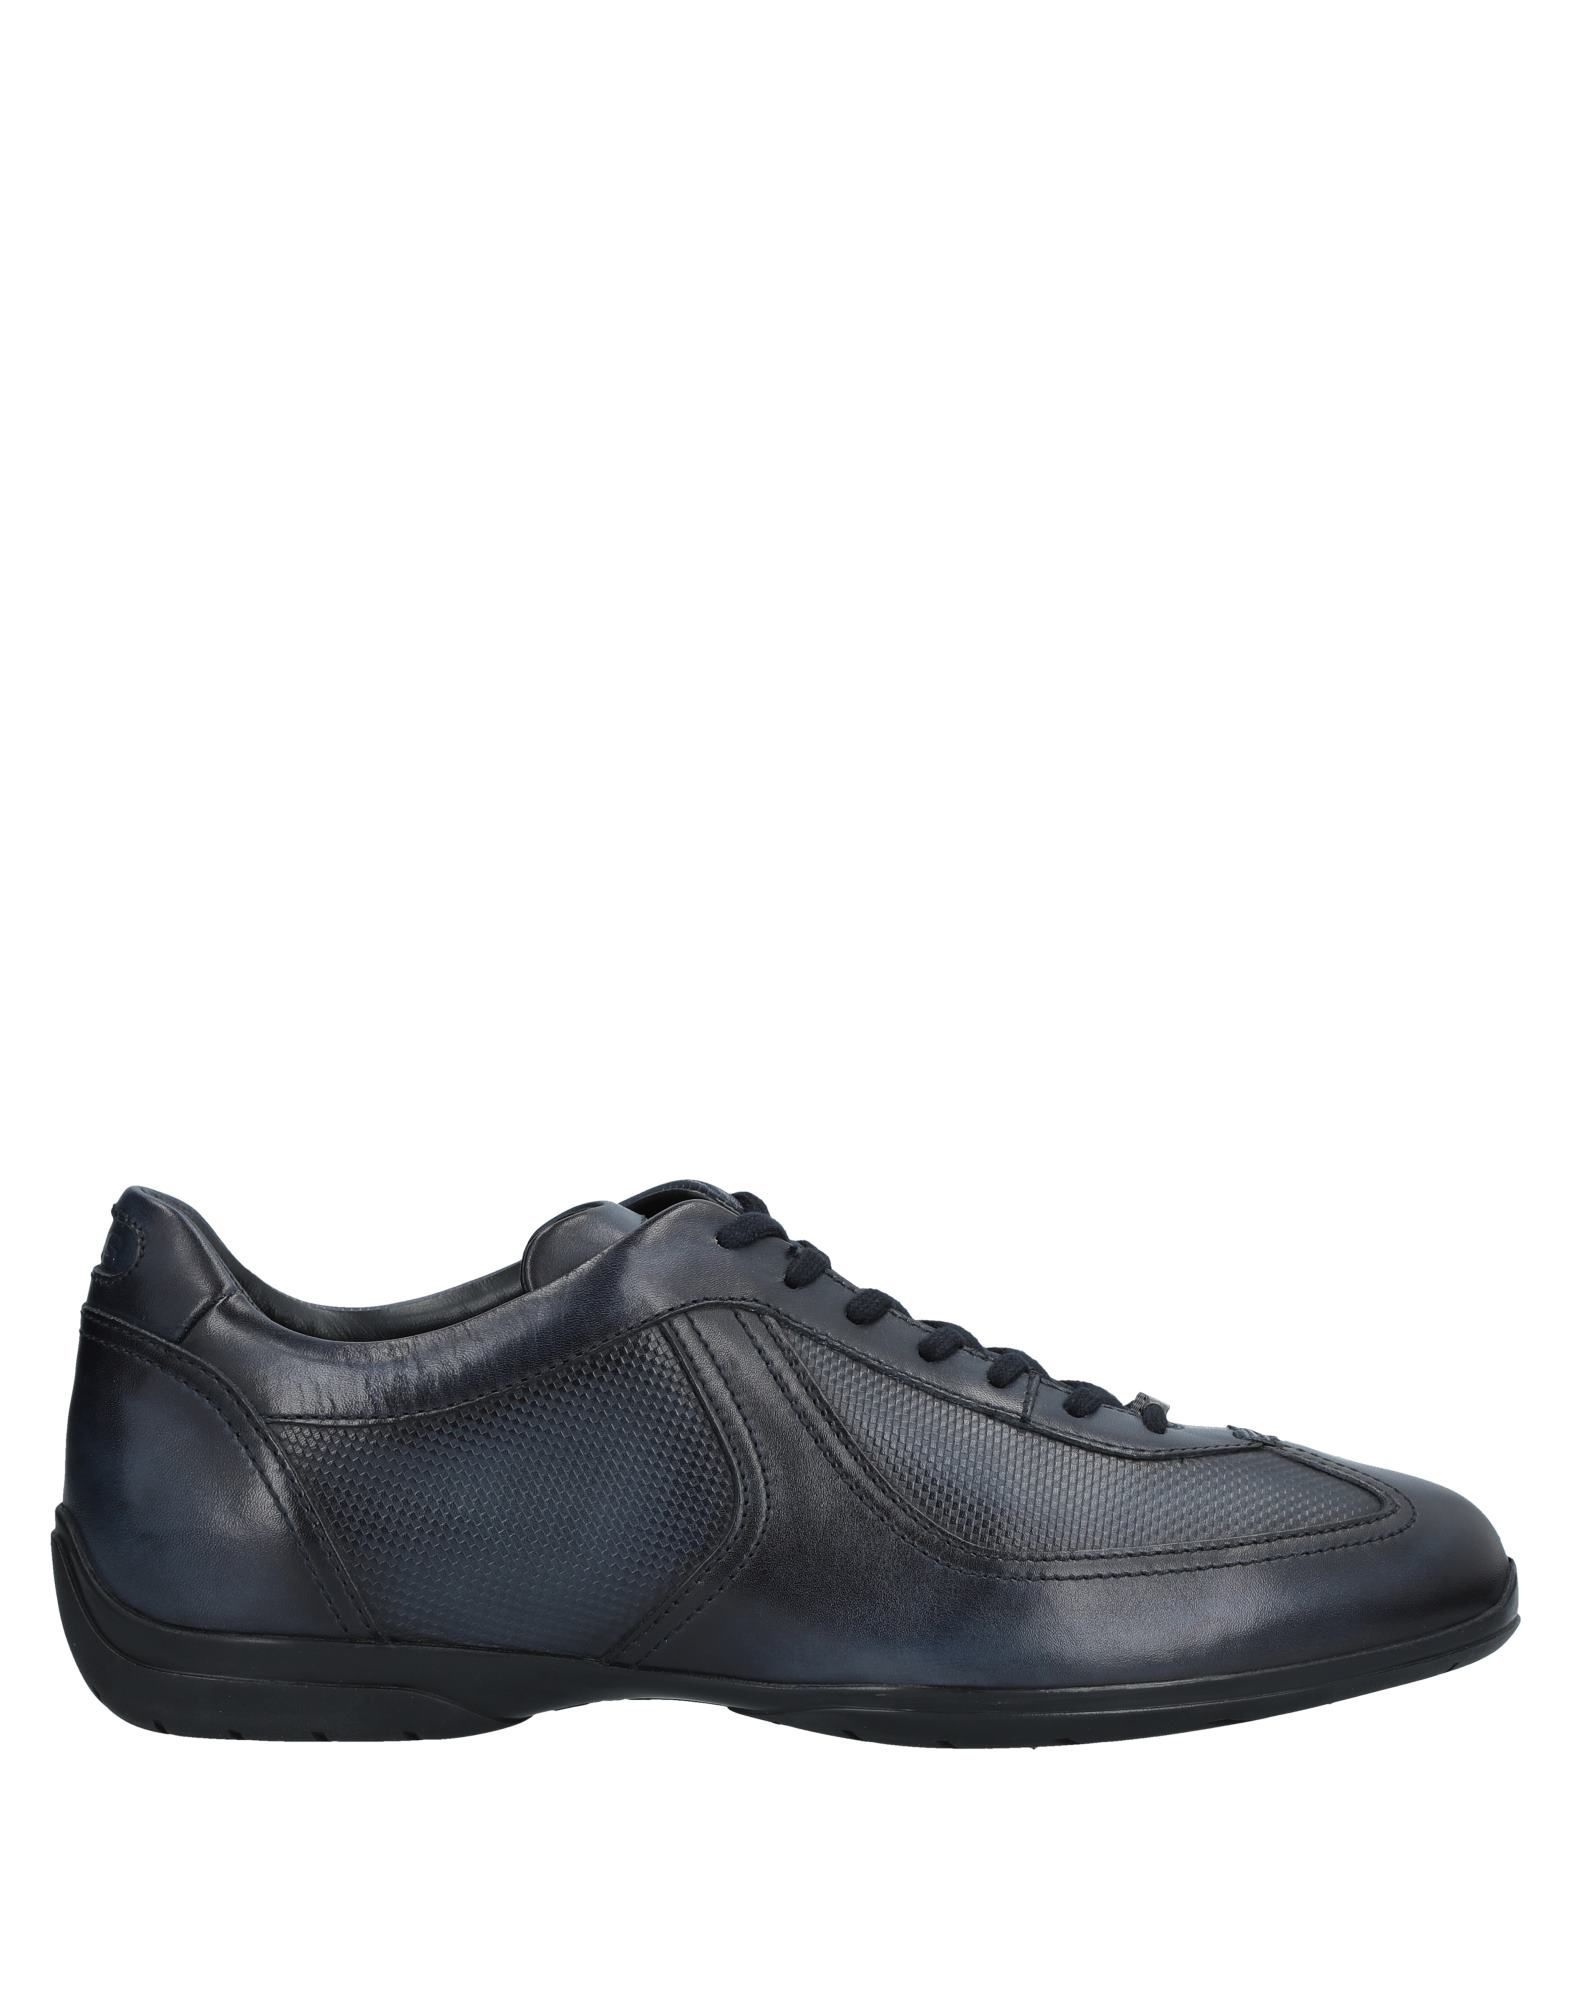 Santoni Sneakers - Men Santoni Sneakers online 11540119CR on  Australia - 11540119CR online ecdda3